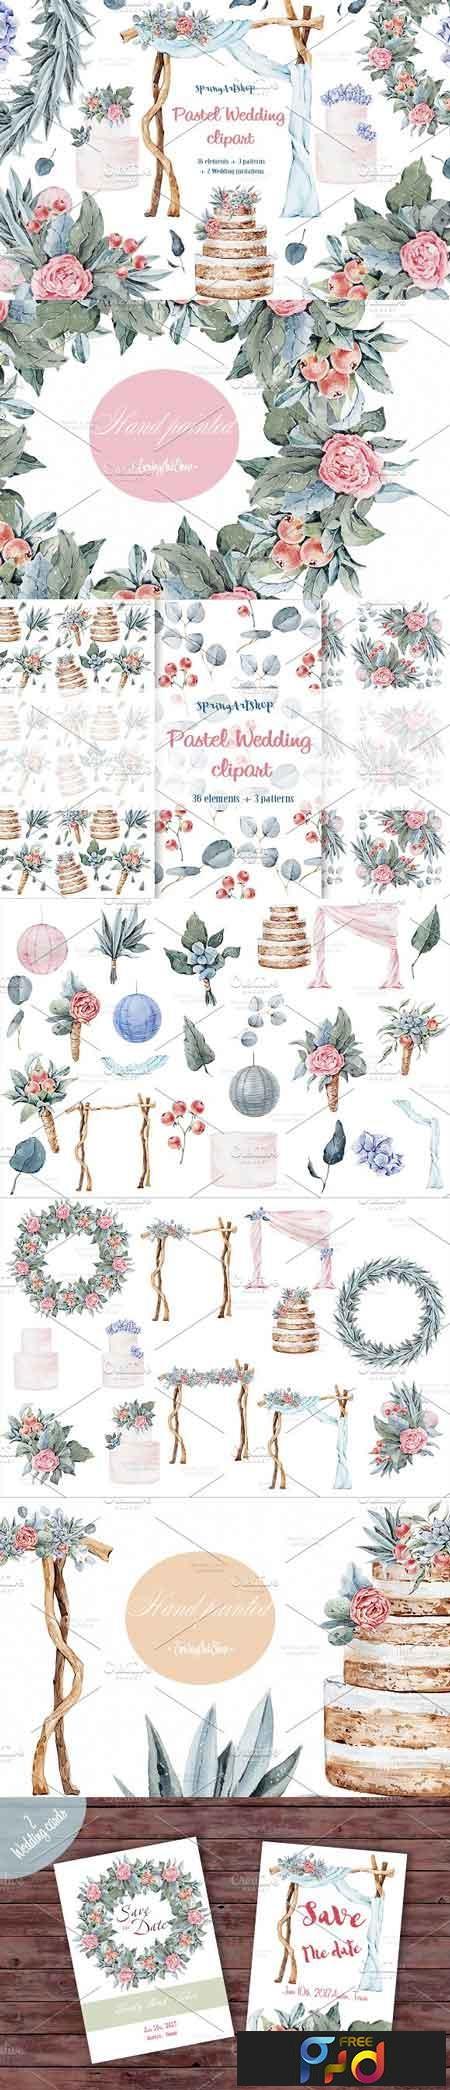 Pastel wedding watercolor clipart 1522384 1